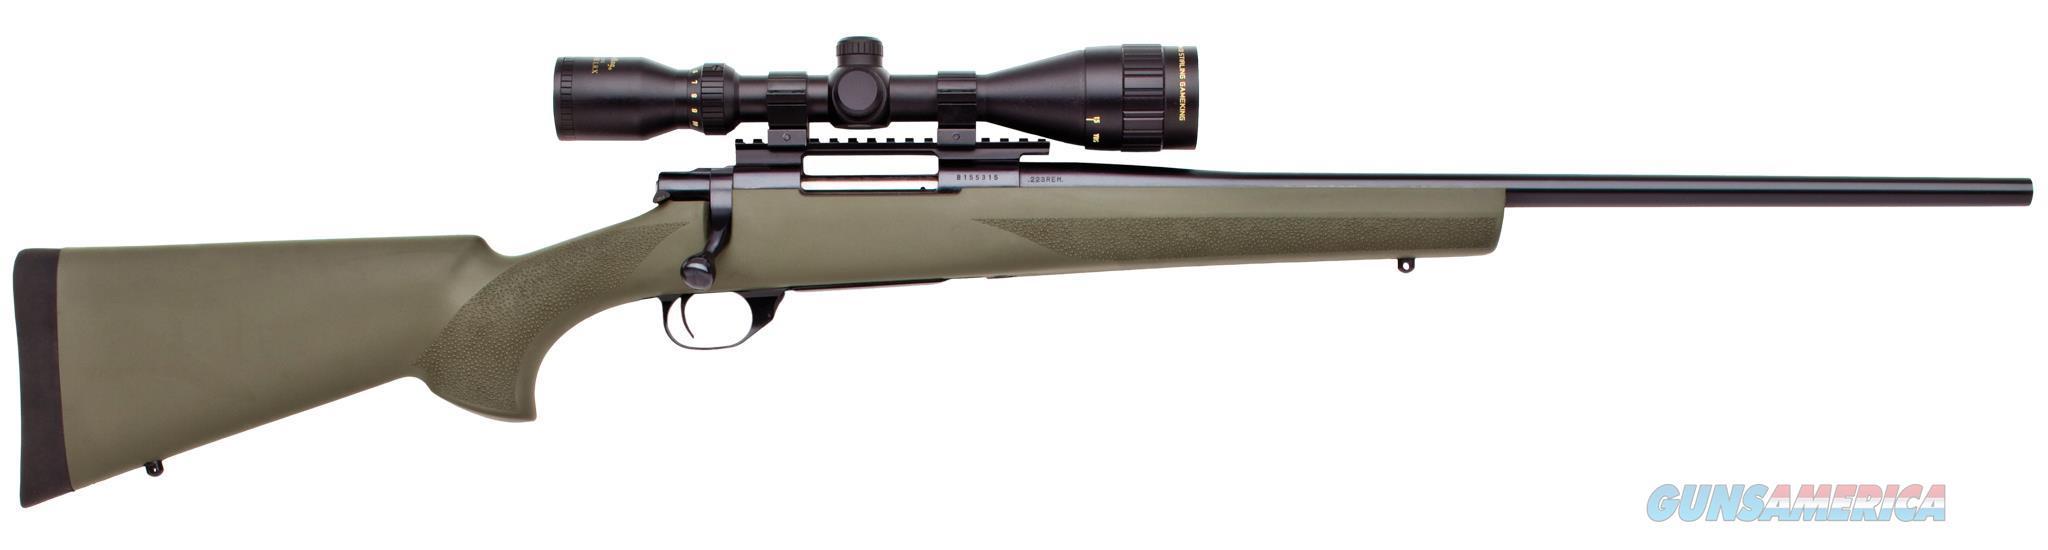 "Howa Hgk63208+ Hogue Gameking Scope Package Bolt 30-06 Springfield 22"" 5+1 Hogue Overmolded Green Stk Blued HGK63208+  Guns > Rifles > L Misc Rifles"